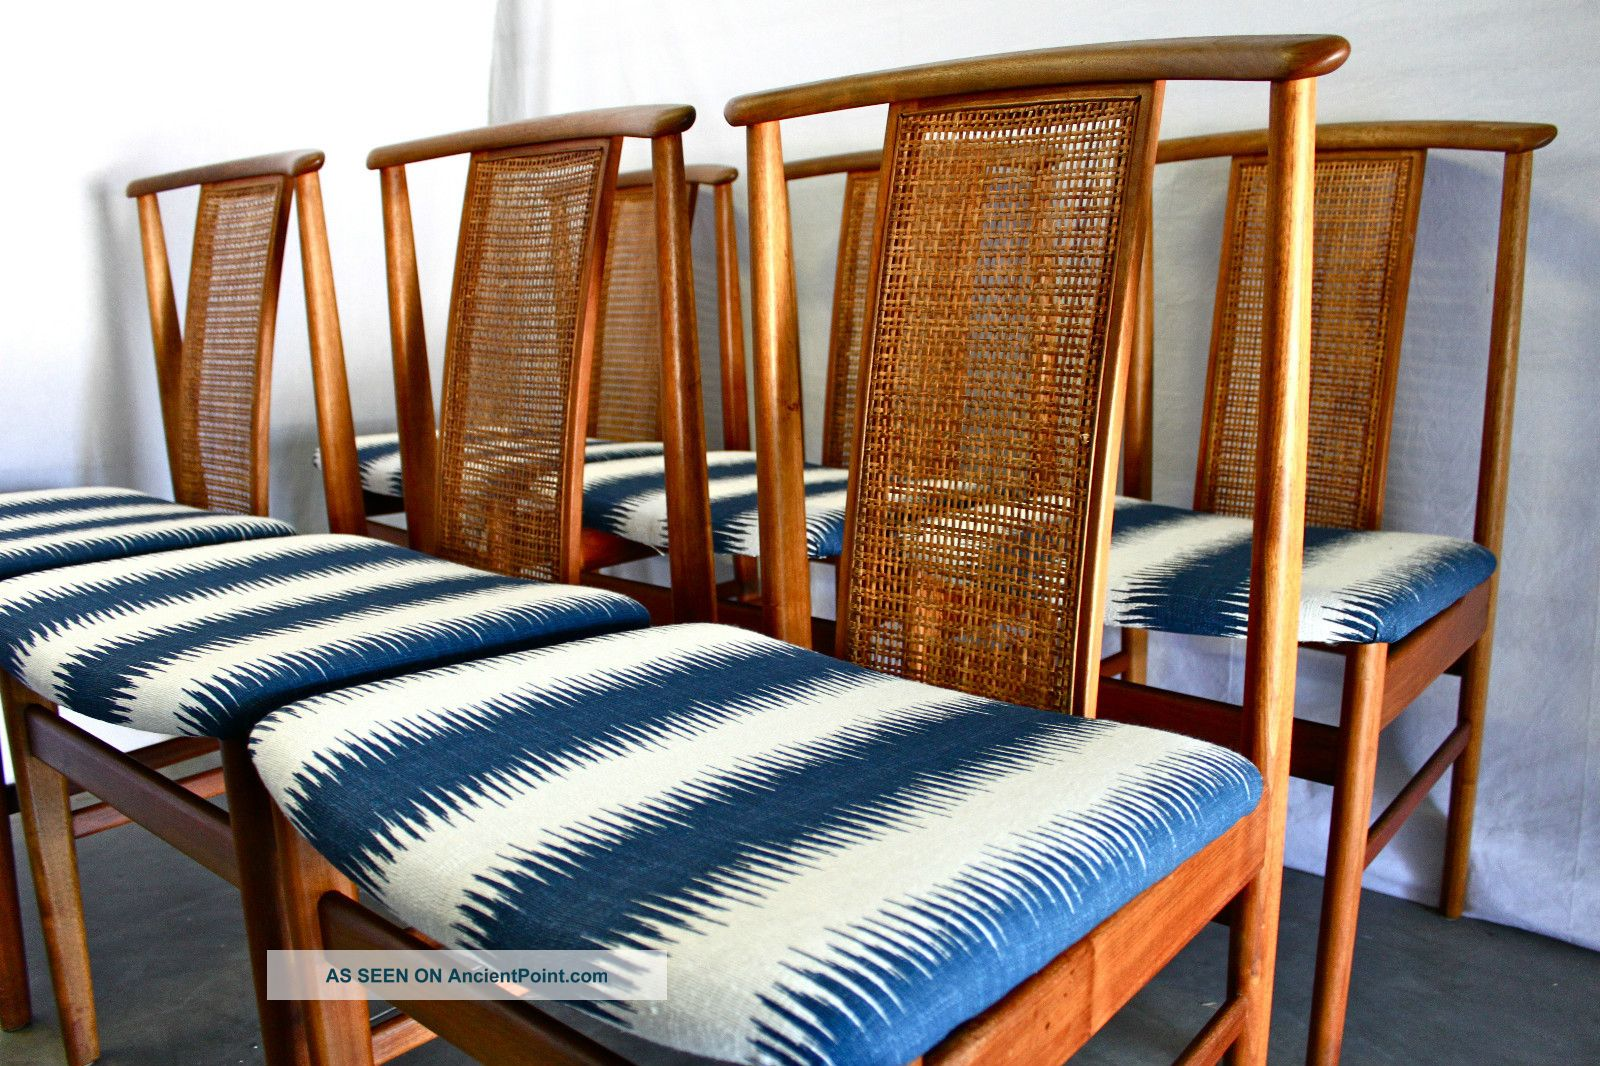 Set 6 Danish Mid Century Walnut Dining Chairs Eames Modern Teak Moller Koefoeds 1900-1950 photo